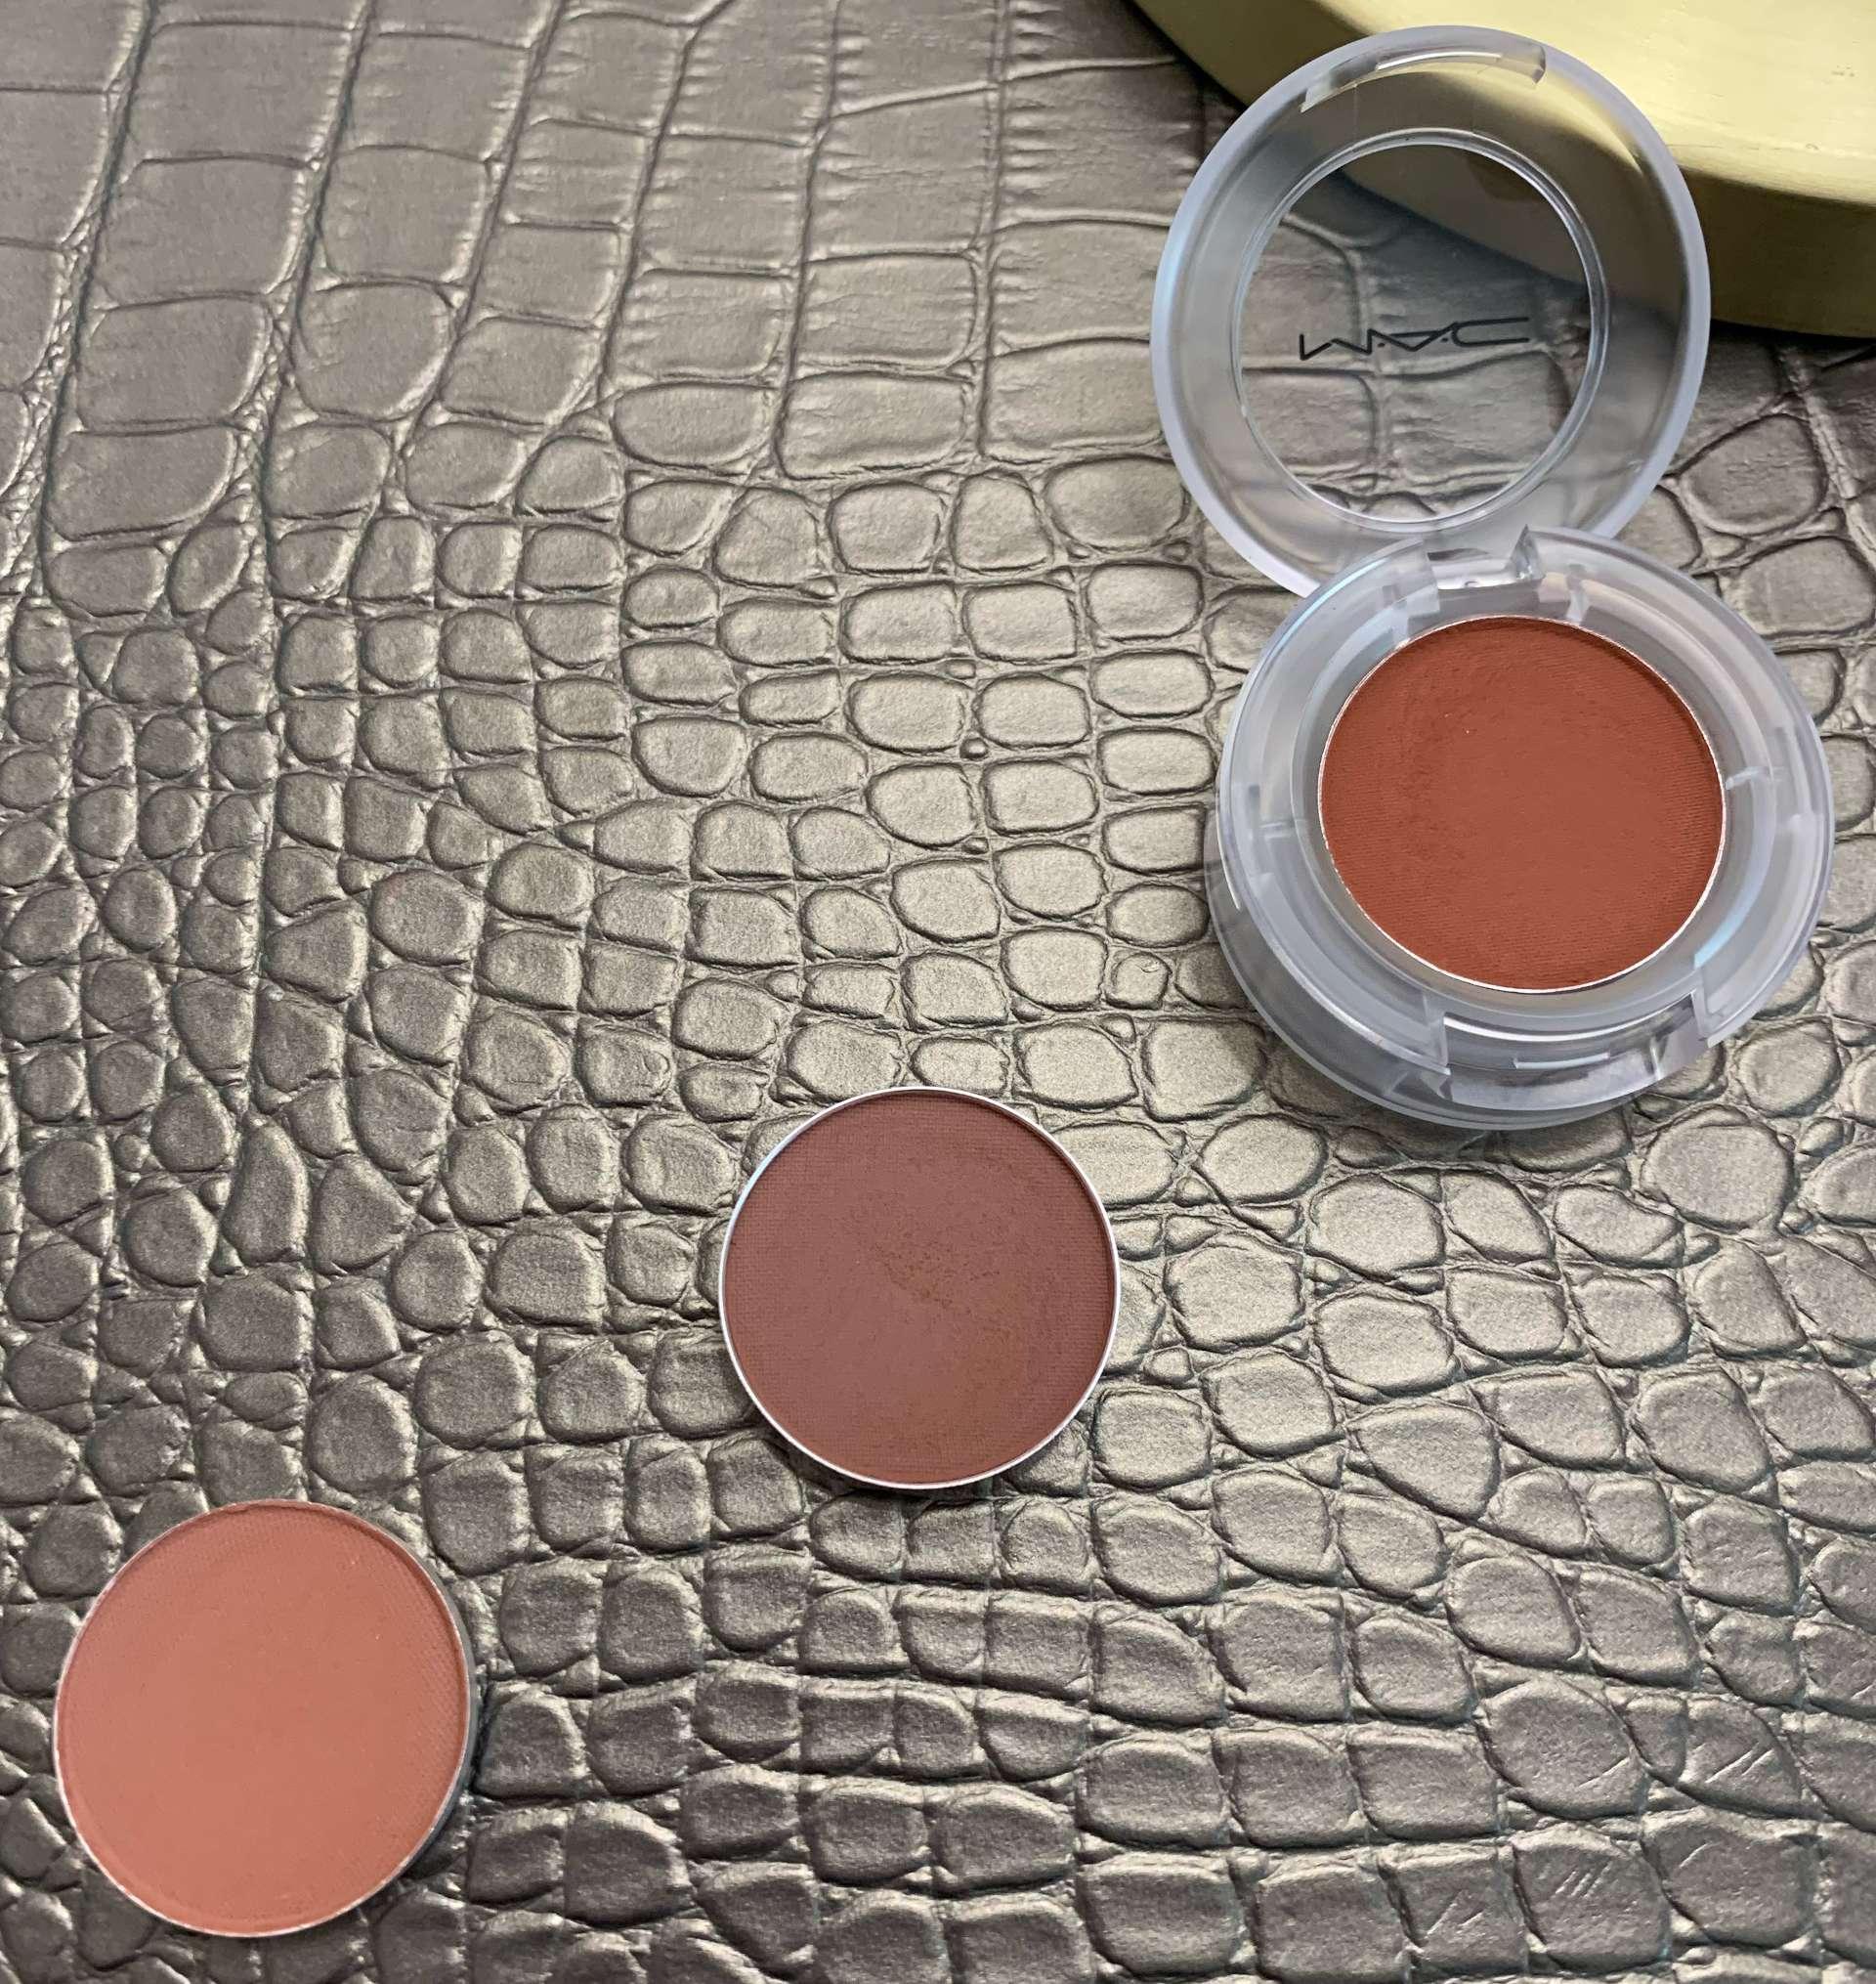 MAC eyeshadows brown script, swiss chocolate, bougie babe (LE) swatches on medium dark skin